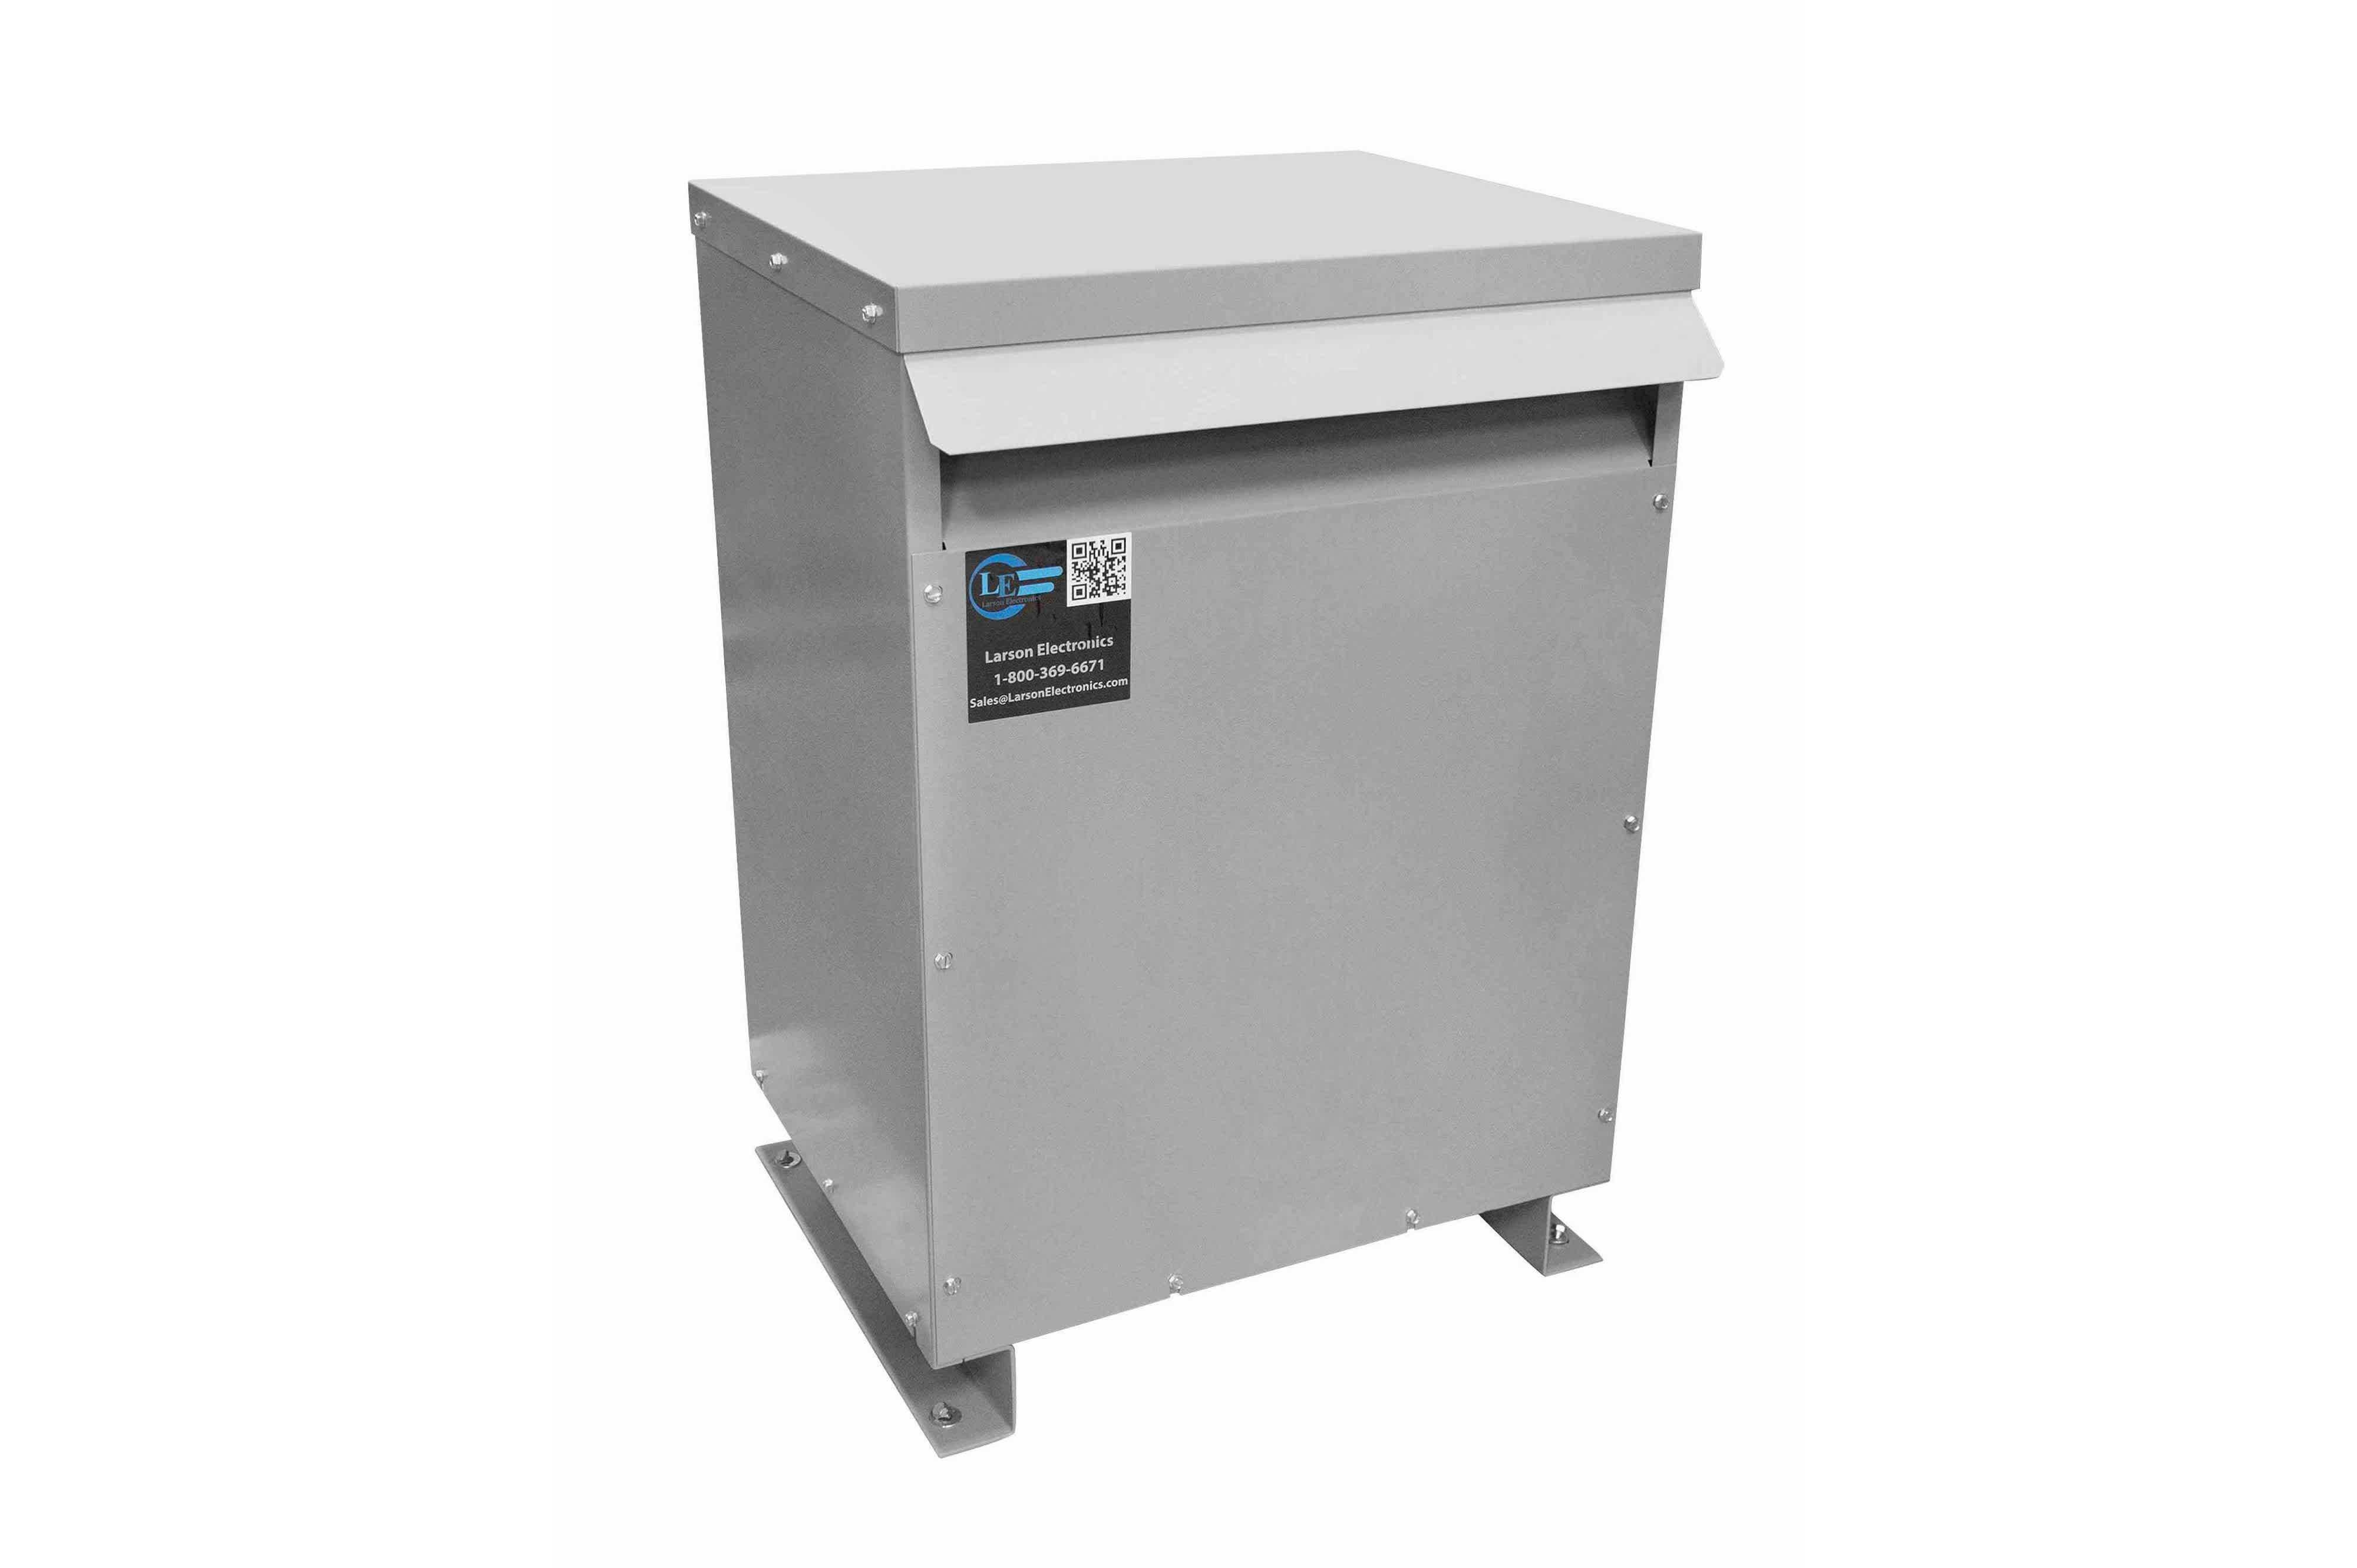 22.5 kVA 3PH Isolation Transformer, 600V Wye Primary, 415V Delta Secondary, N3R, Ventilated, 60 Hz